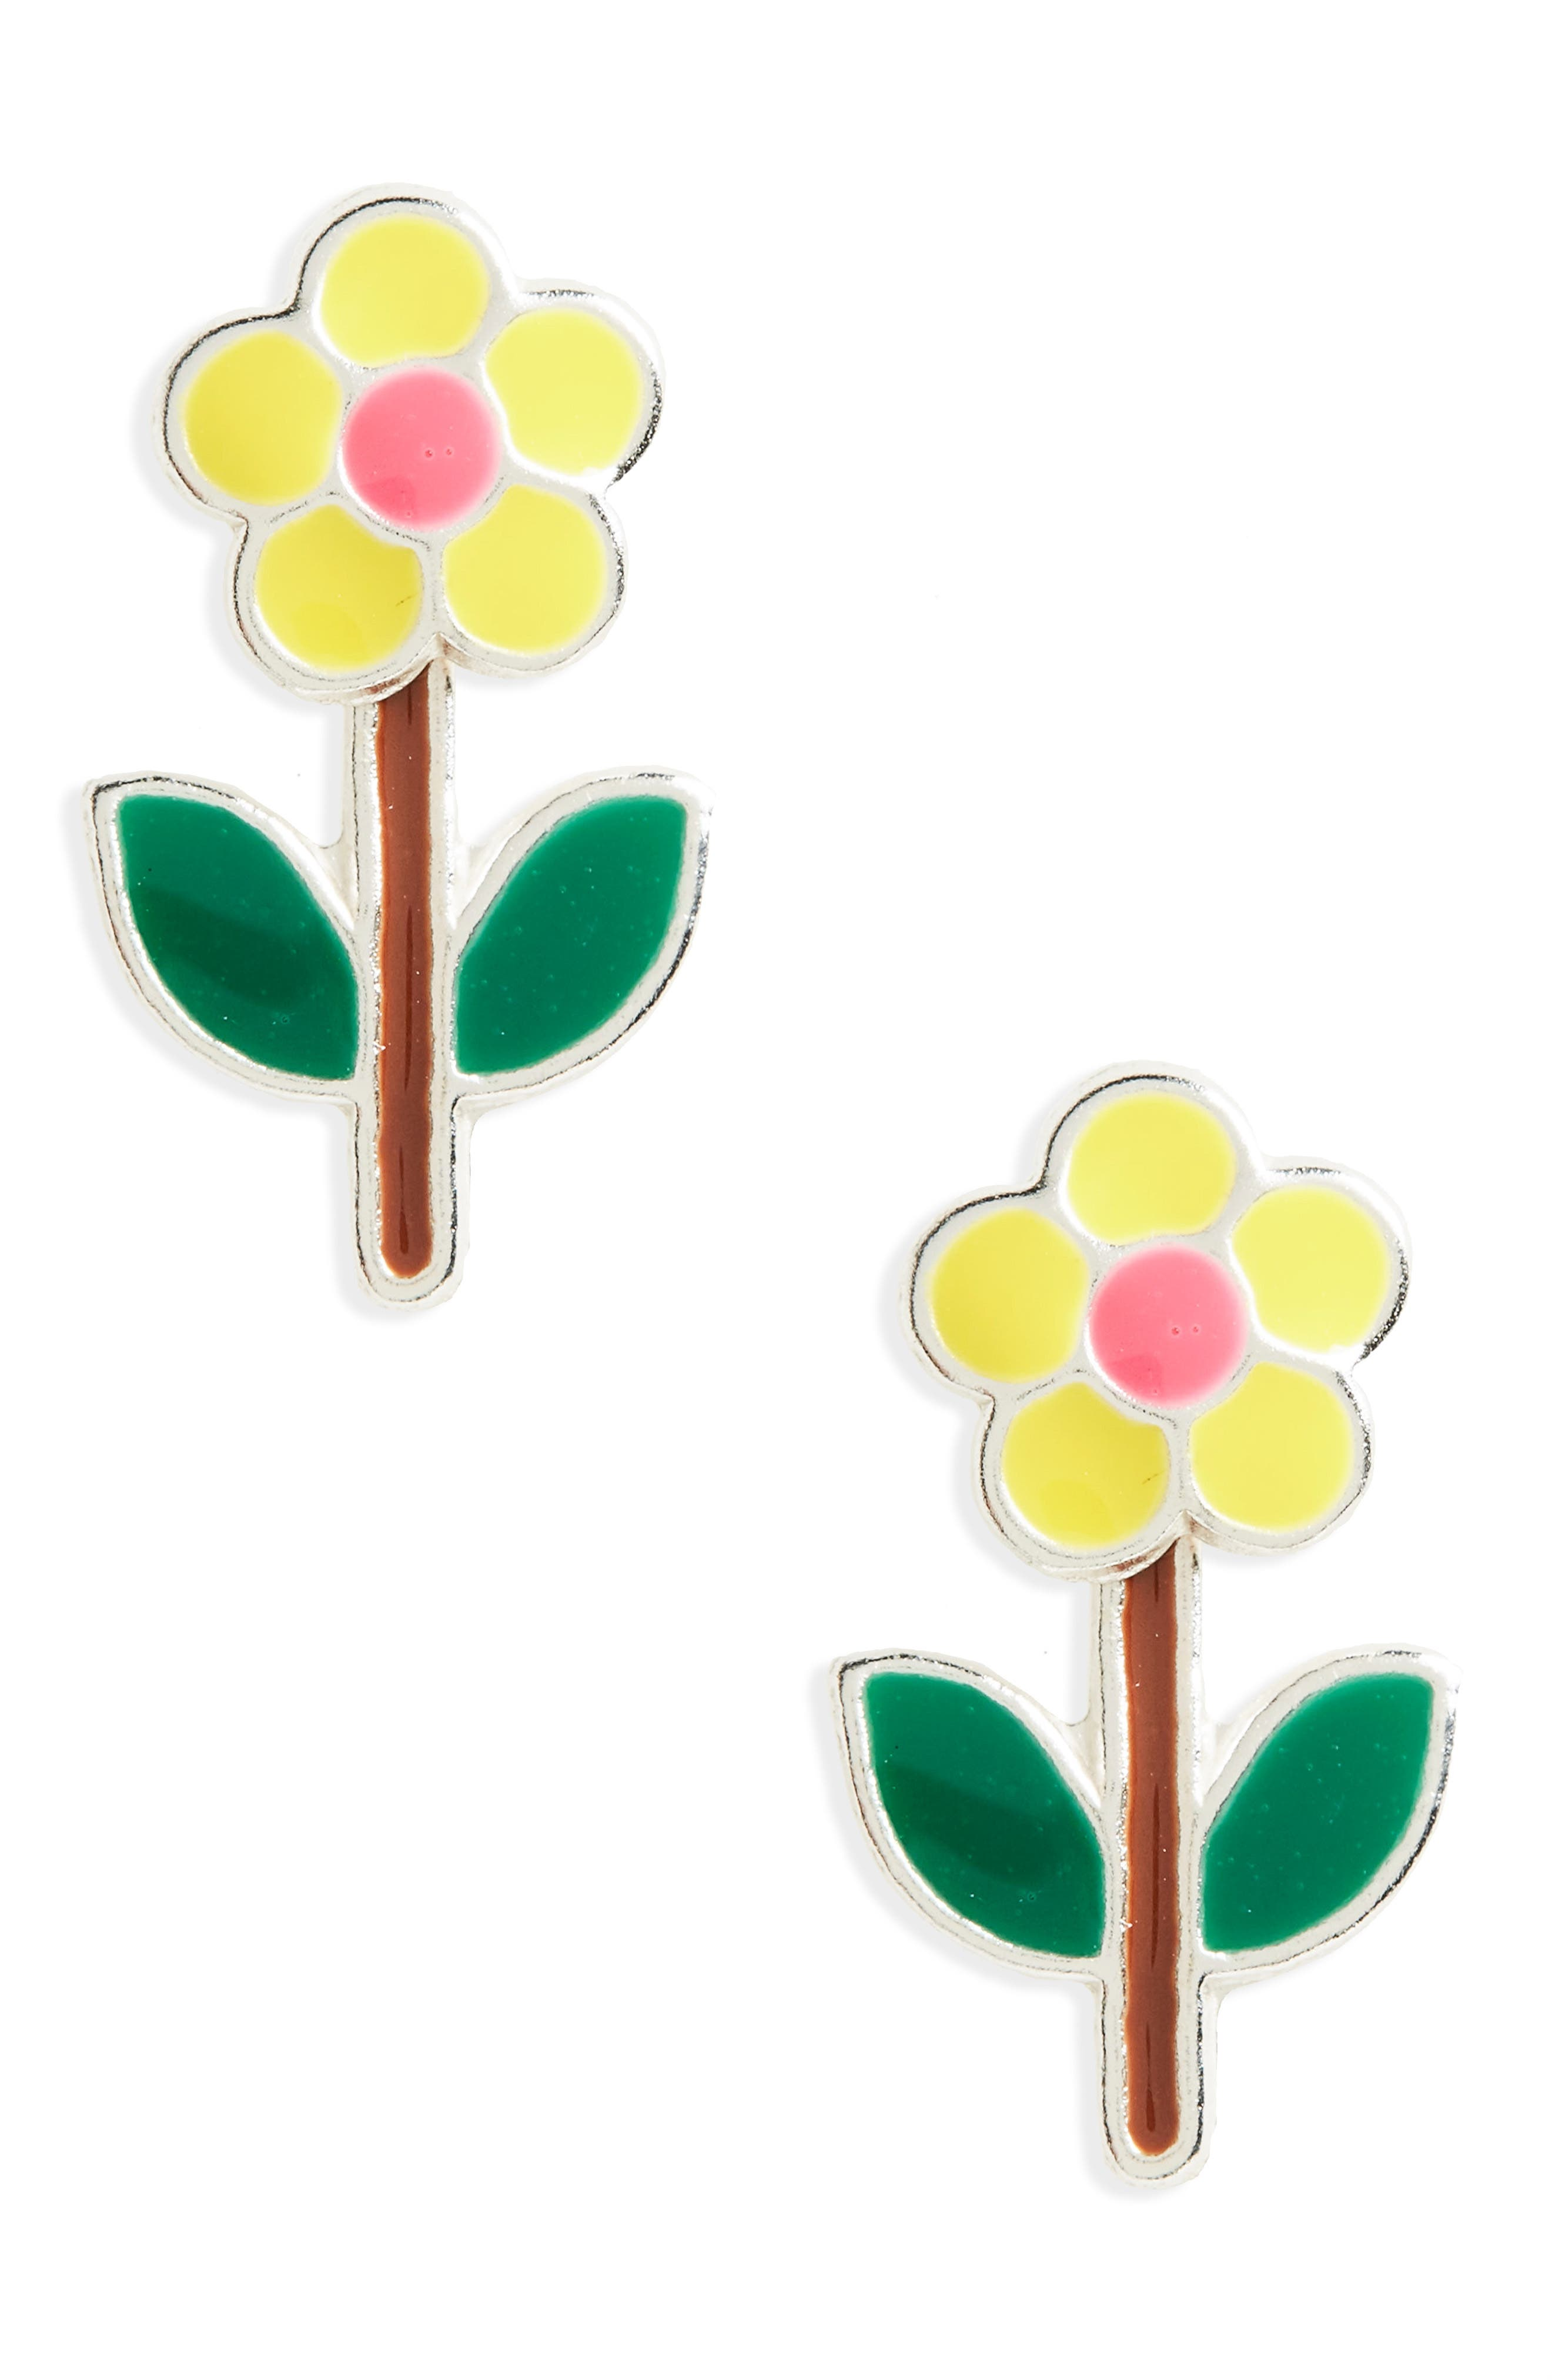 Flower Sterling Silver Stud Earrings,                         Main,                         color,